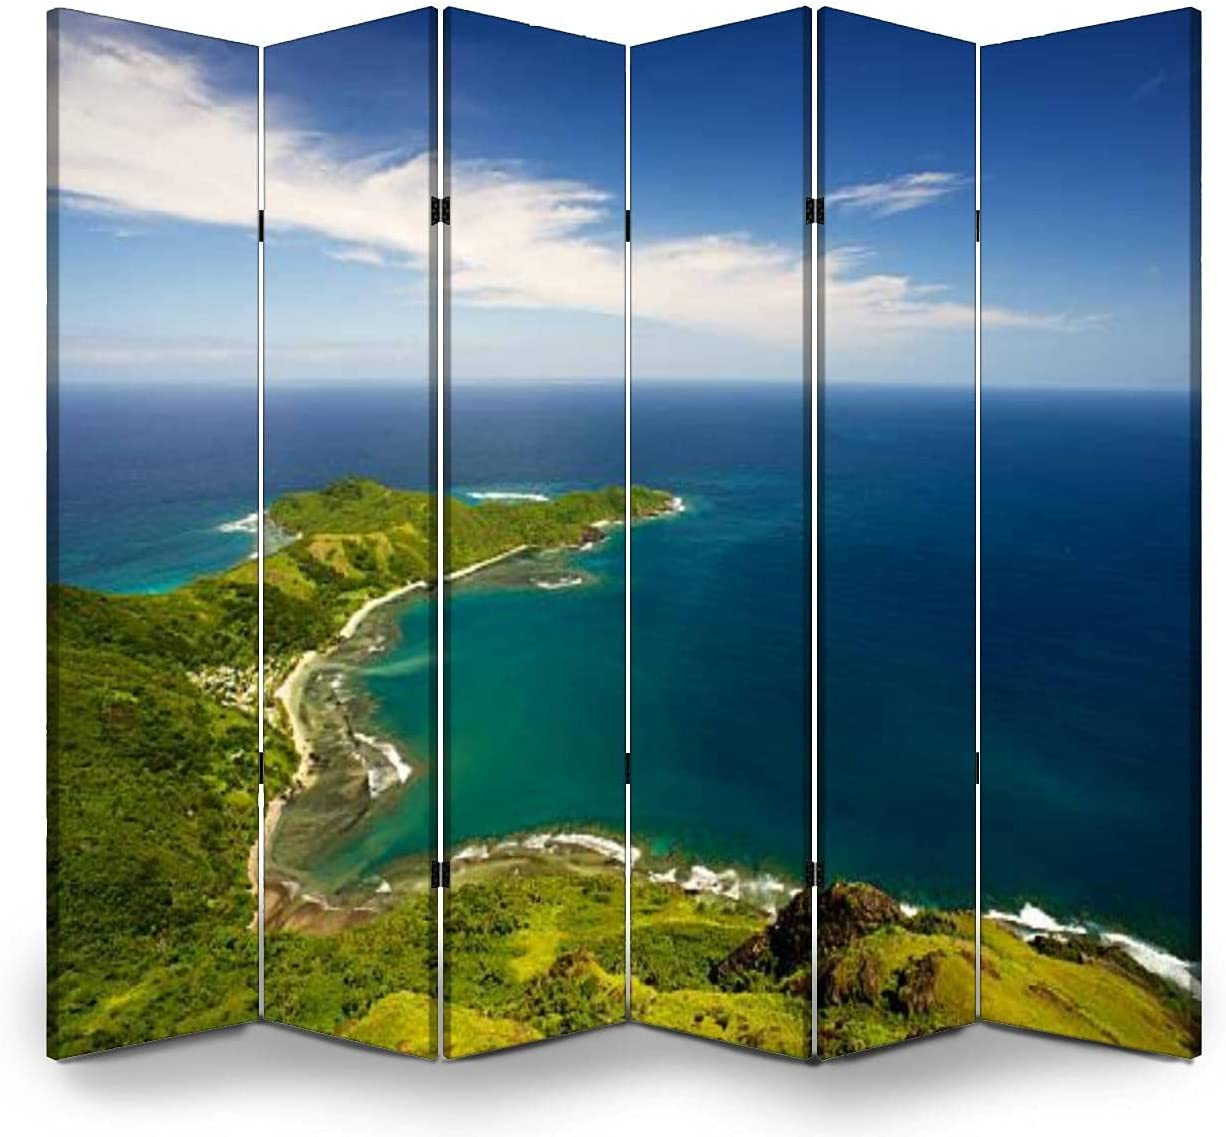 Dola-Dola 6 Panel Screen Room Divider Over New San Antonio Mall product Waya View Island Yasa